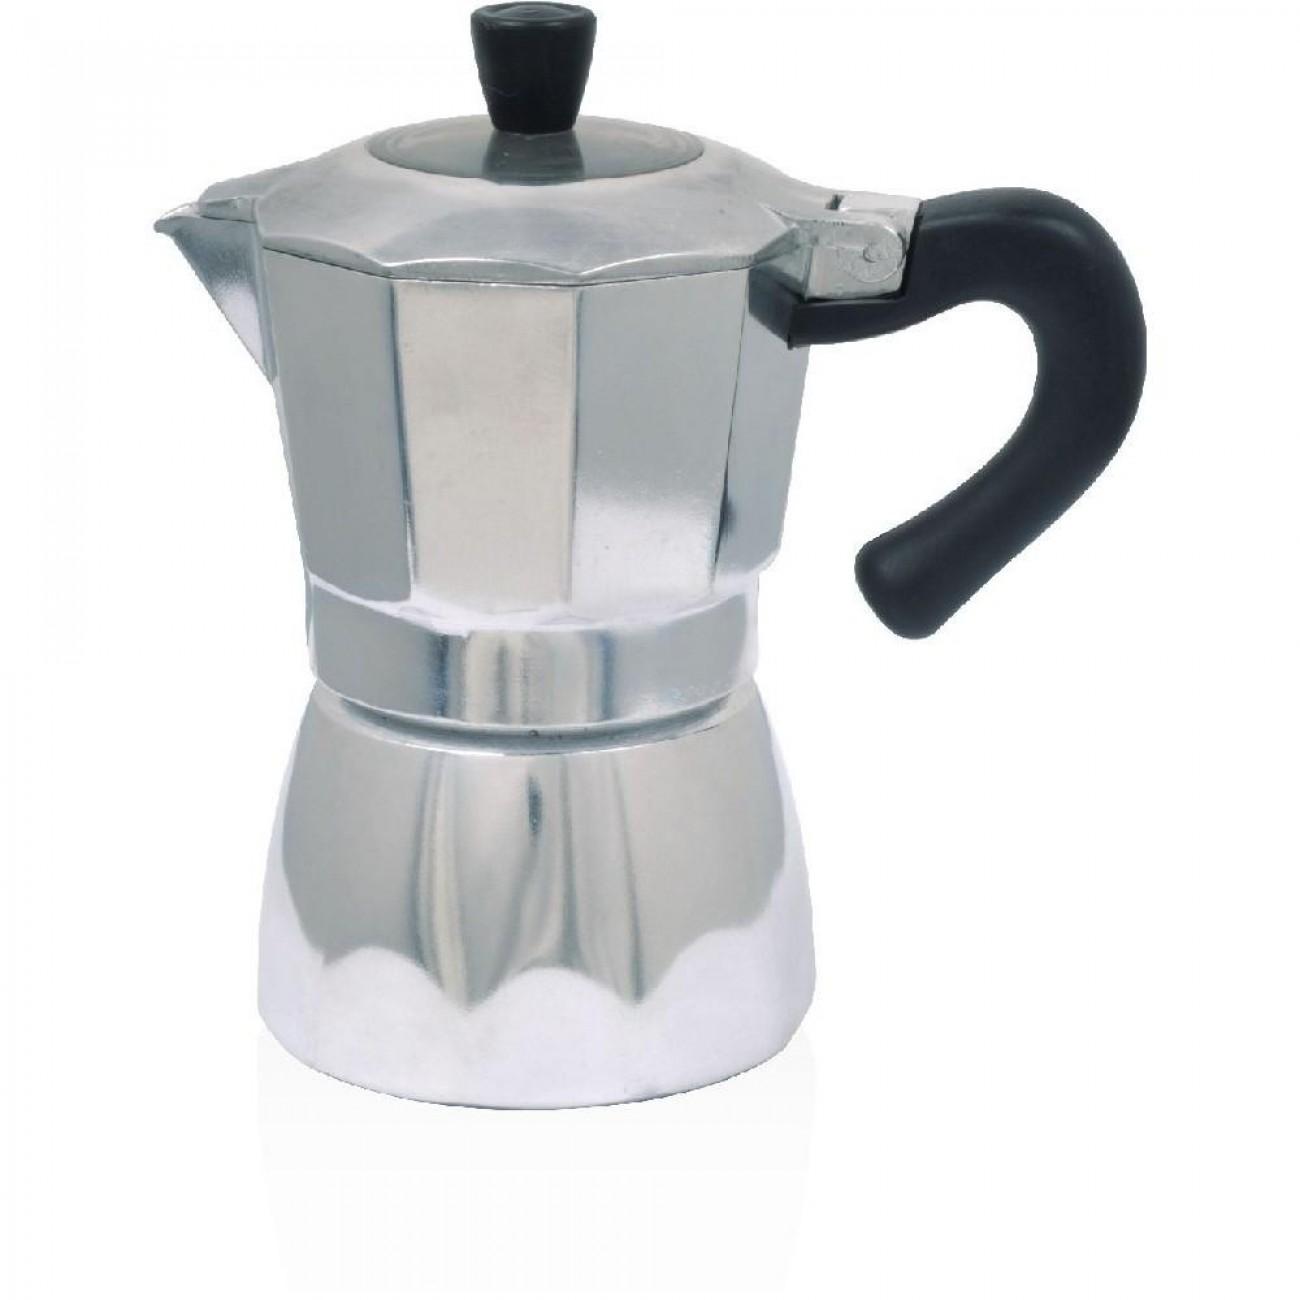 Кубинска кафеварка SAPIR SP 1173 E9, Вместимост: 9 чаши в Кафеварки за котлон - SAPIR | Alleop